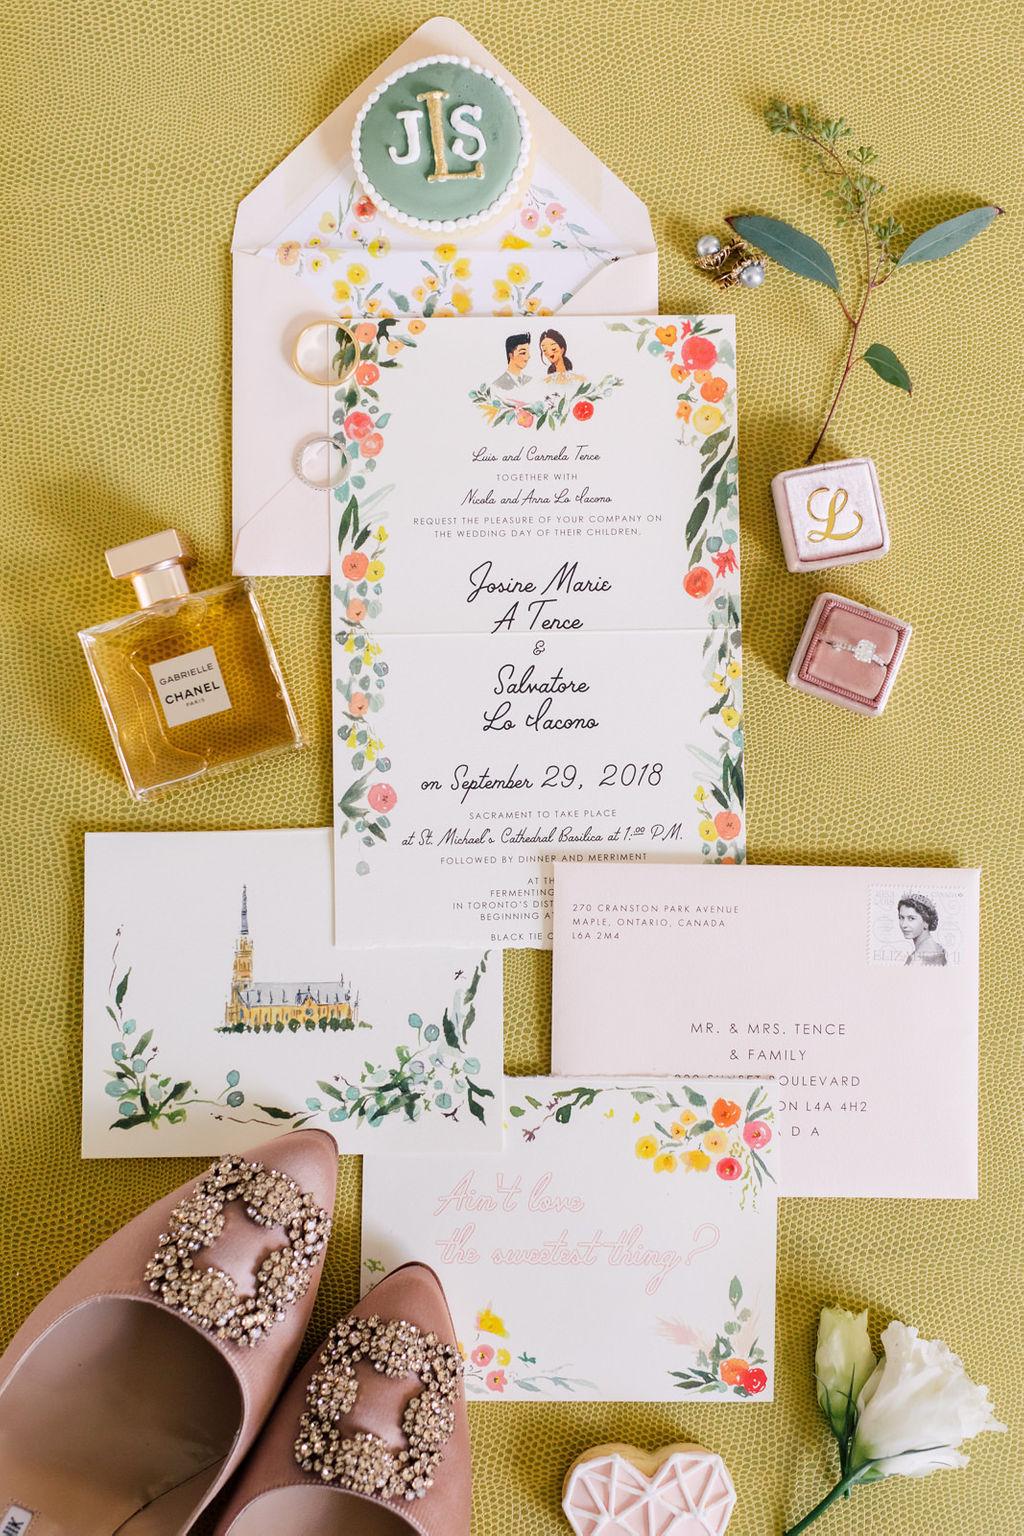 jolly-edition-toronto-wedding tri-fold invitation, tear-away postcard rsvp, printed envelopes, custom envelope liner